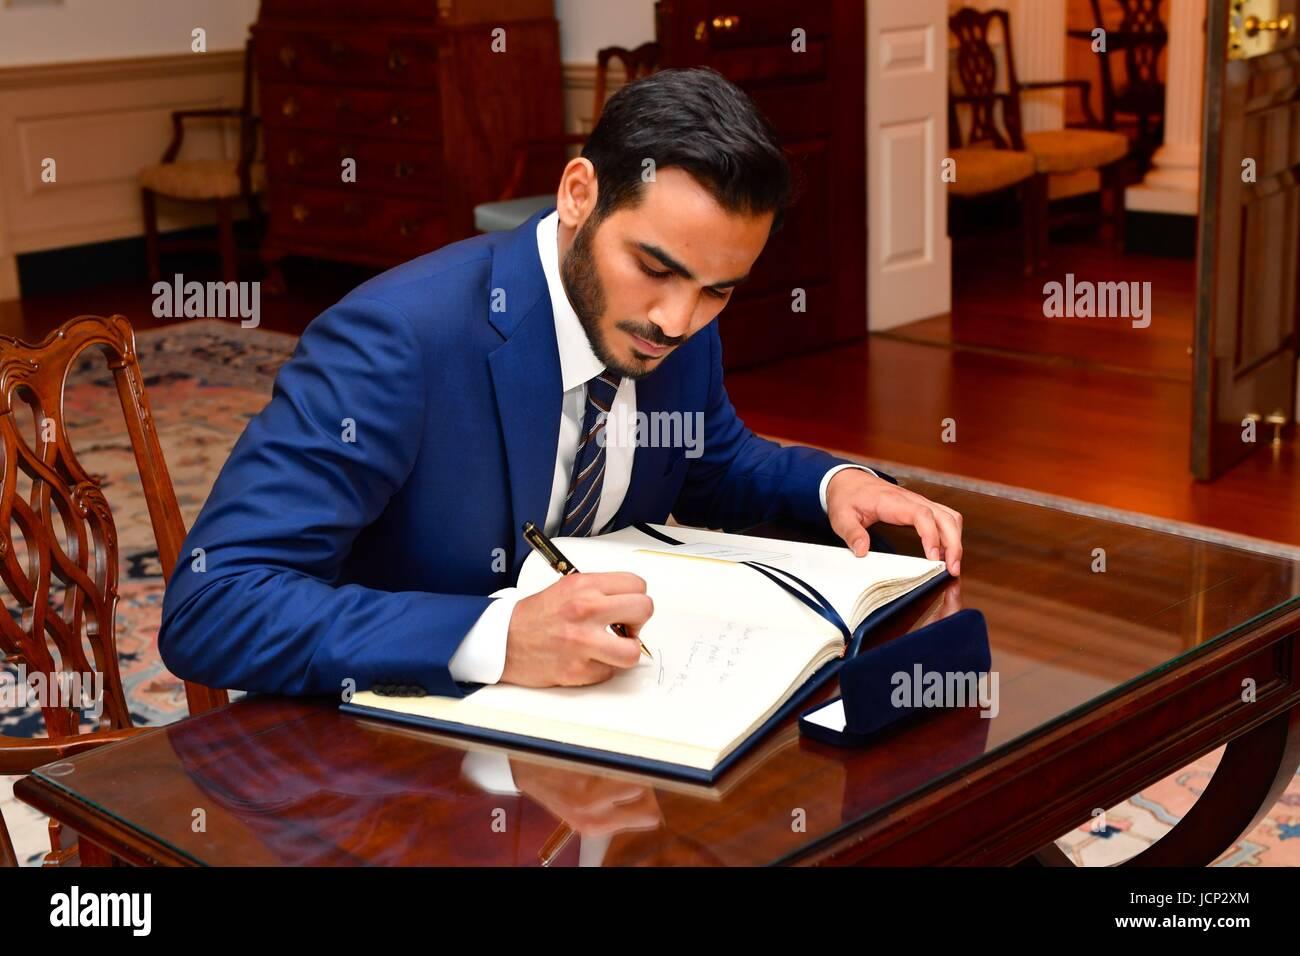 Qatari Secretary to the Emir for Investments Sheikh Mohammed bin Hamad bin Khalifa Al Thani signs the guest book Stock Photo